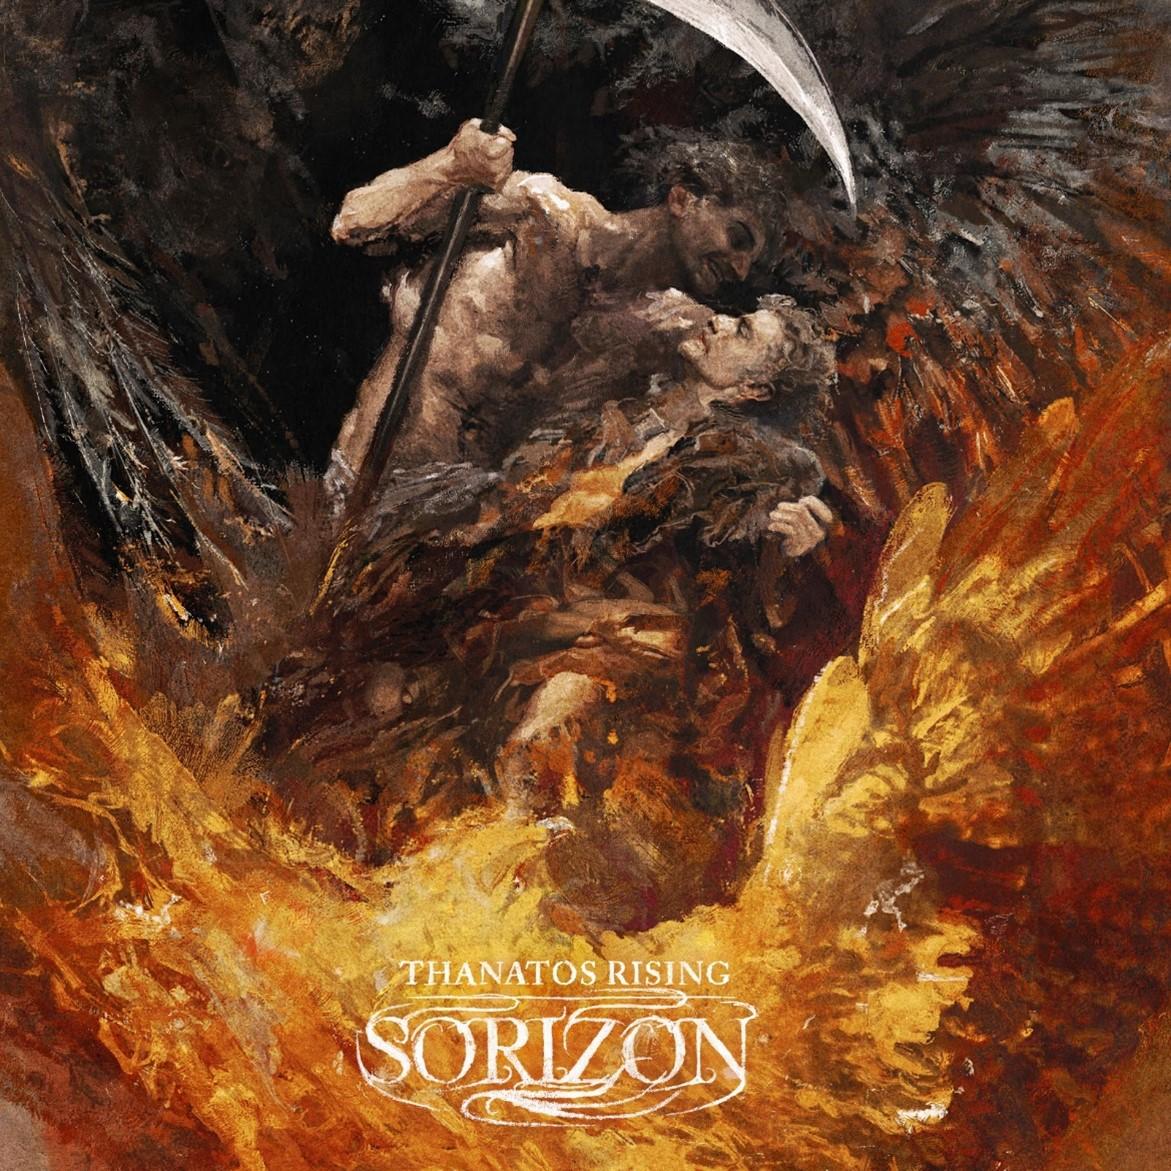 Sorizon full-length Thanatos Rising